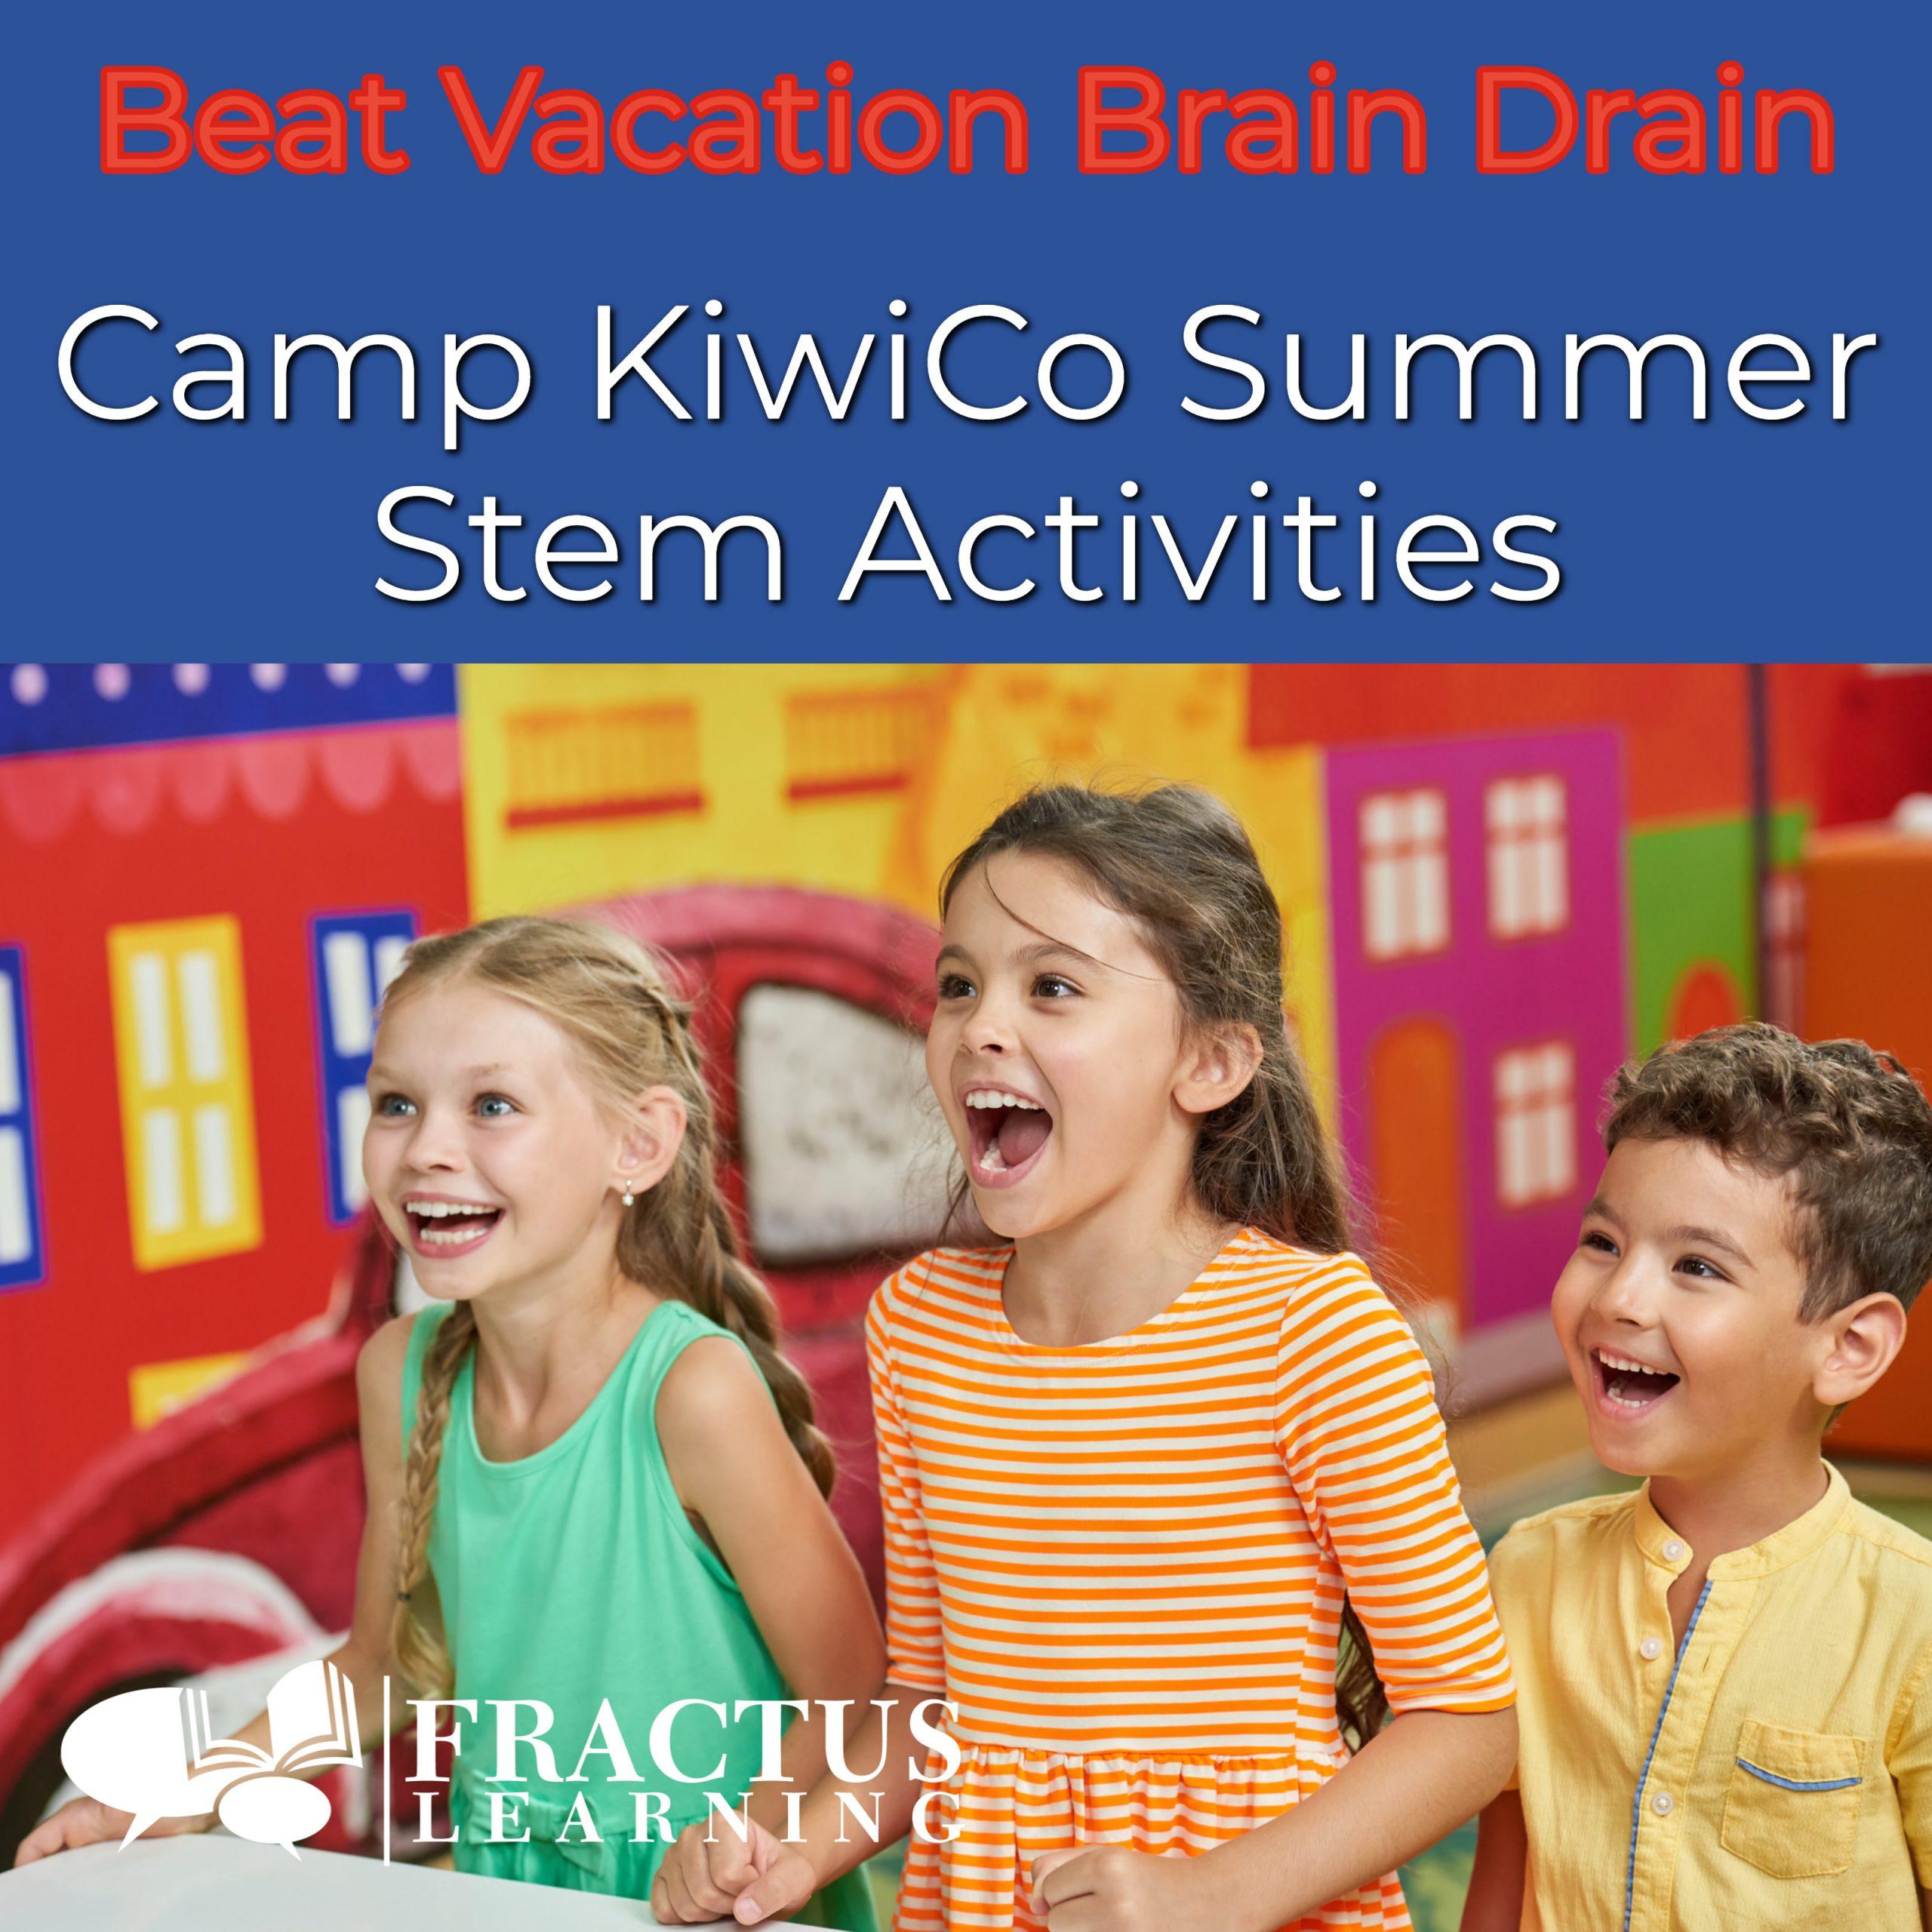 camp kiwico fun summer stem activities for kids